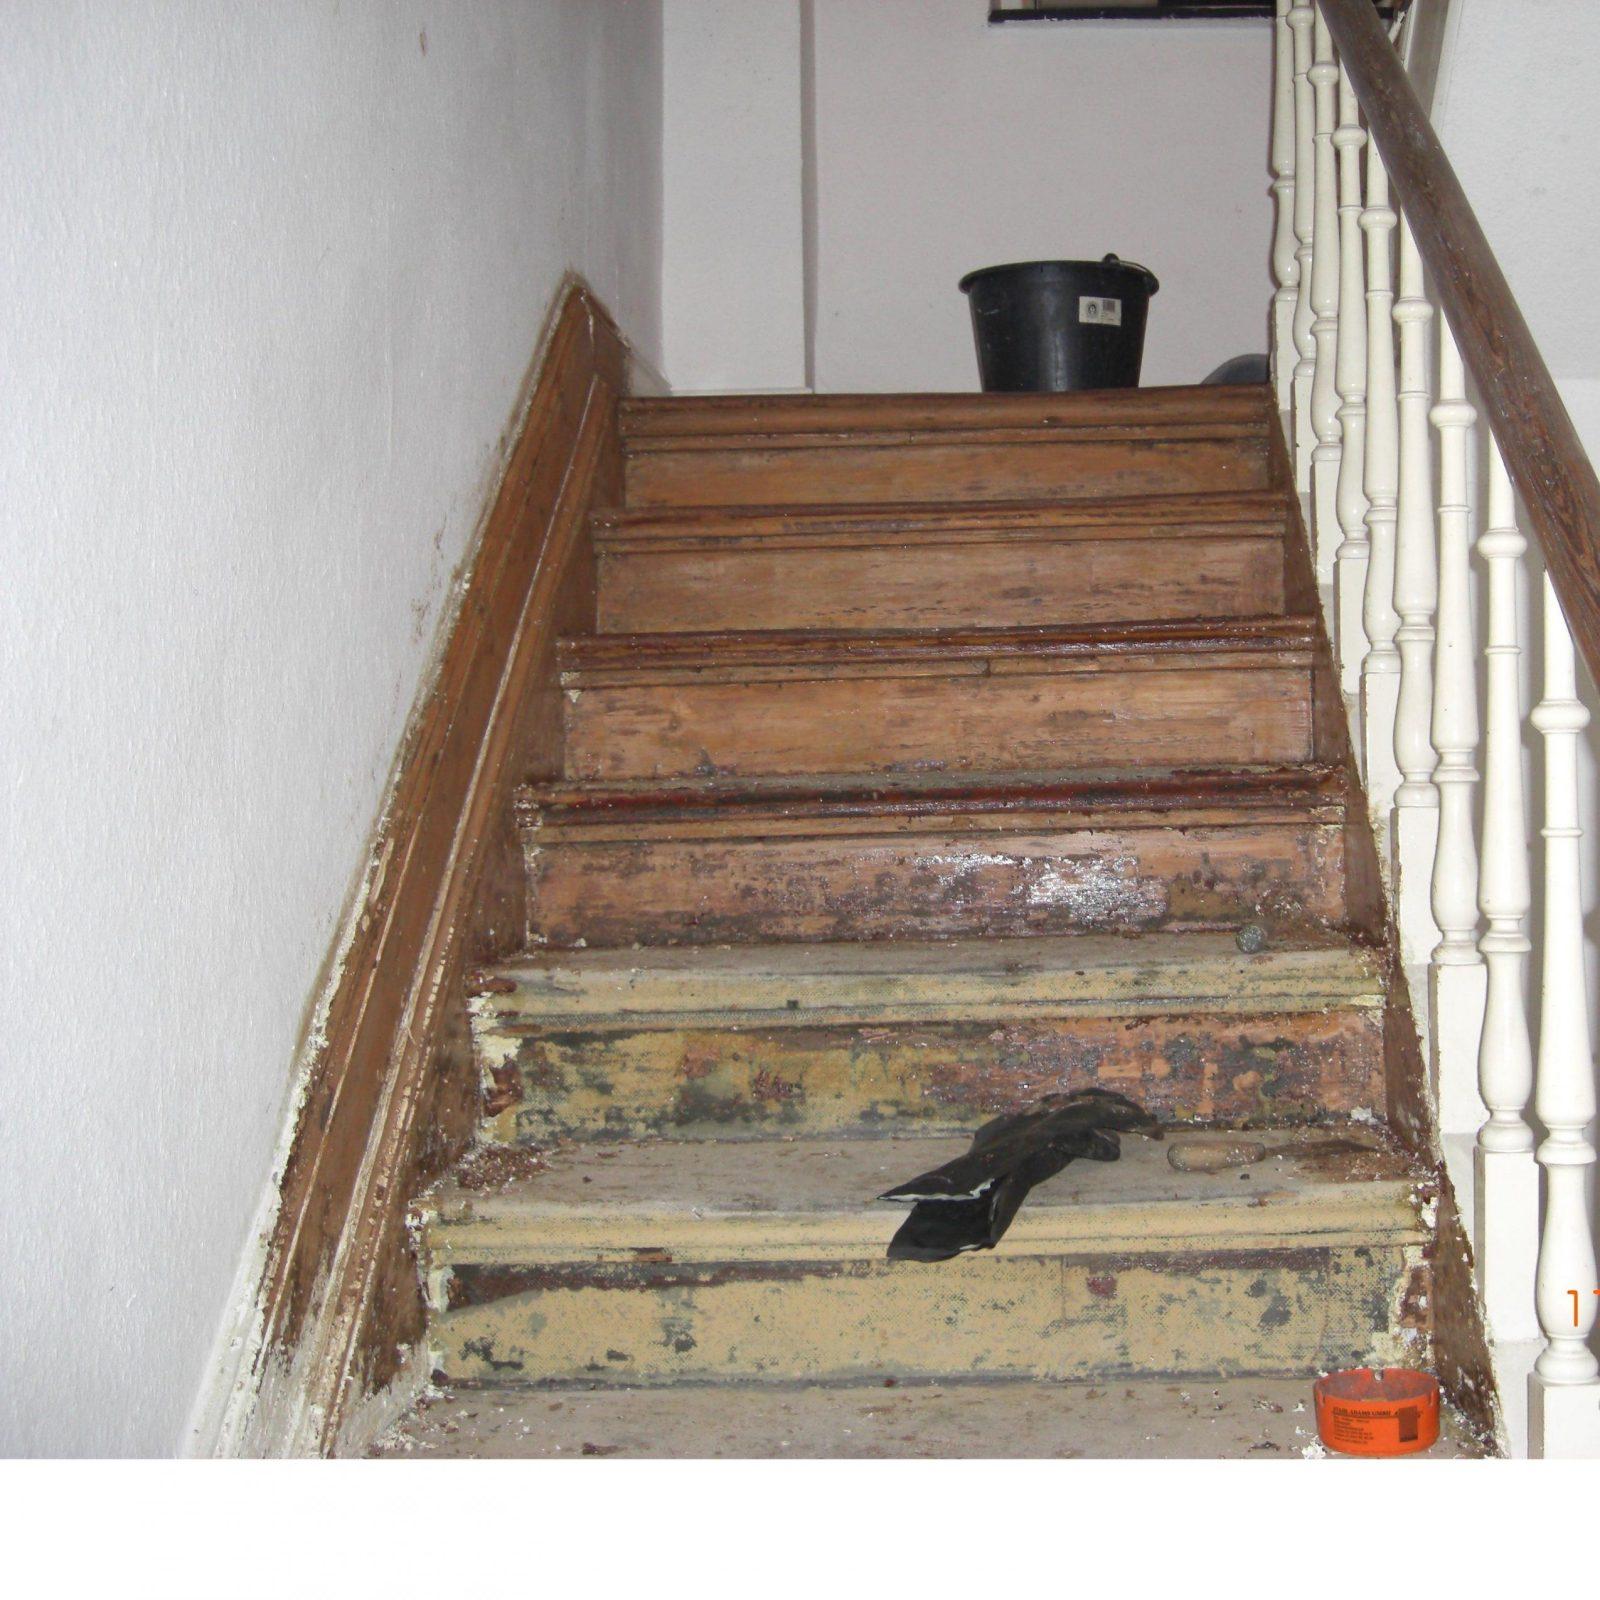 Fabelhafte Alte Holztreppe Streichen Treppe Streichen Beste Von von Holztreppe Streichen Welcher Lack Photo